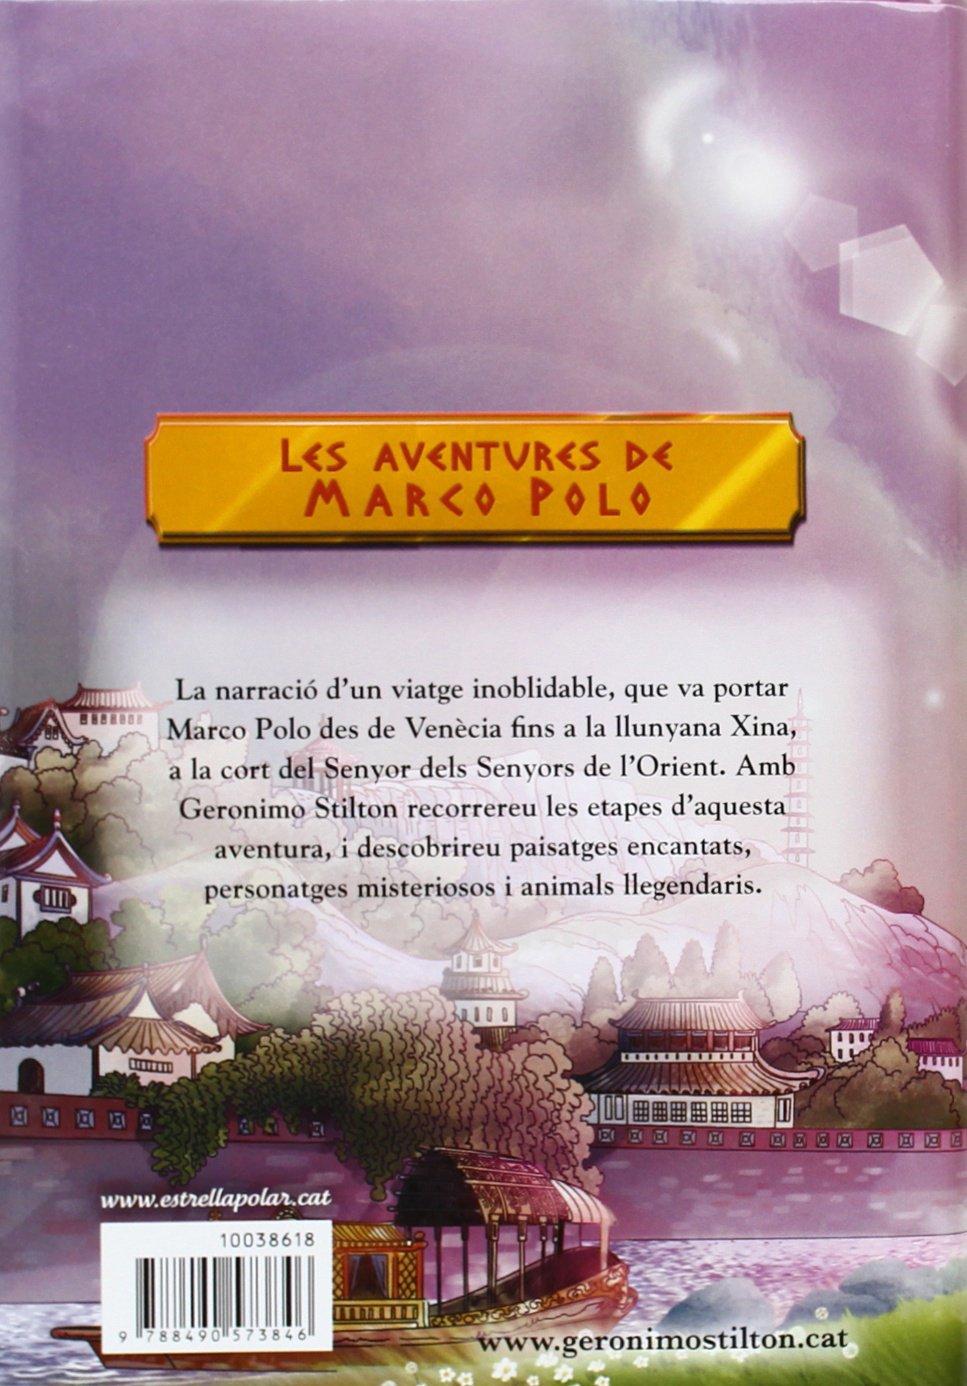 Les Aventures De Marco Polo (Geronimo Stilton): Amazon.es: Stilton ...